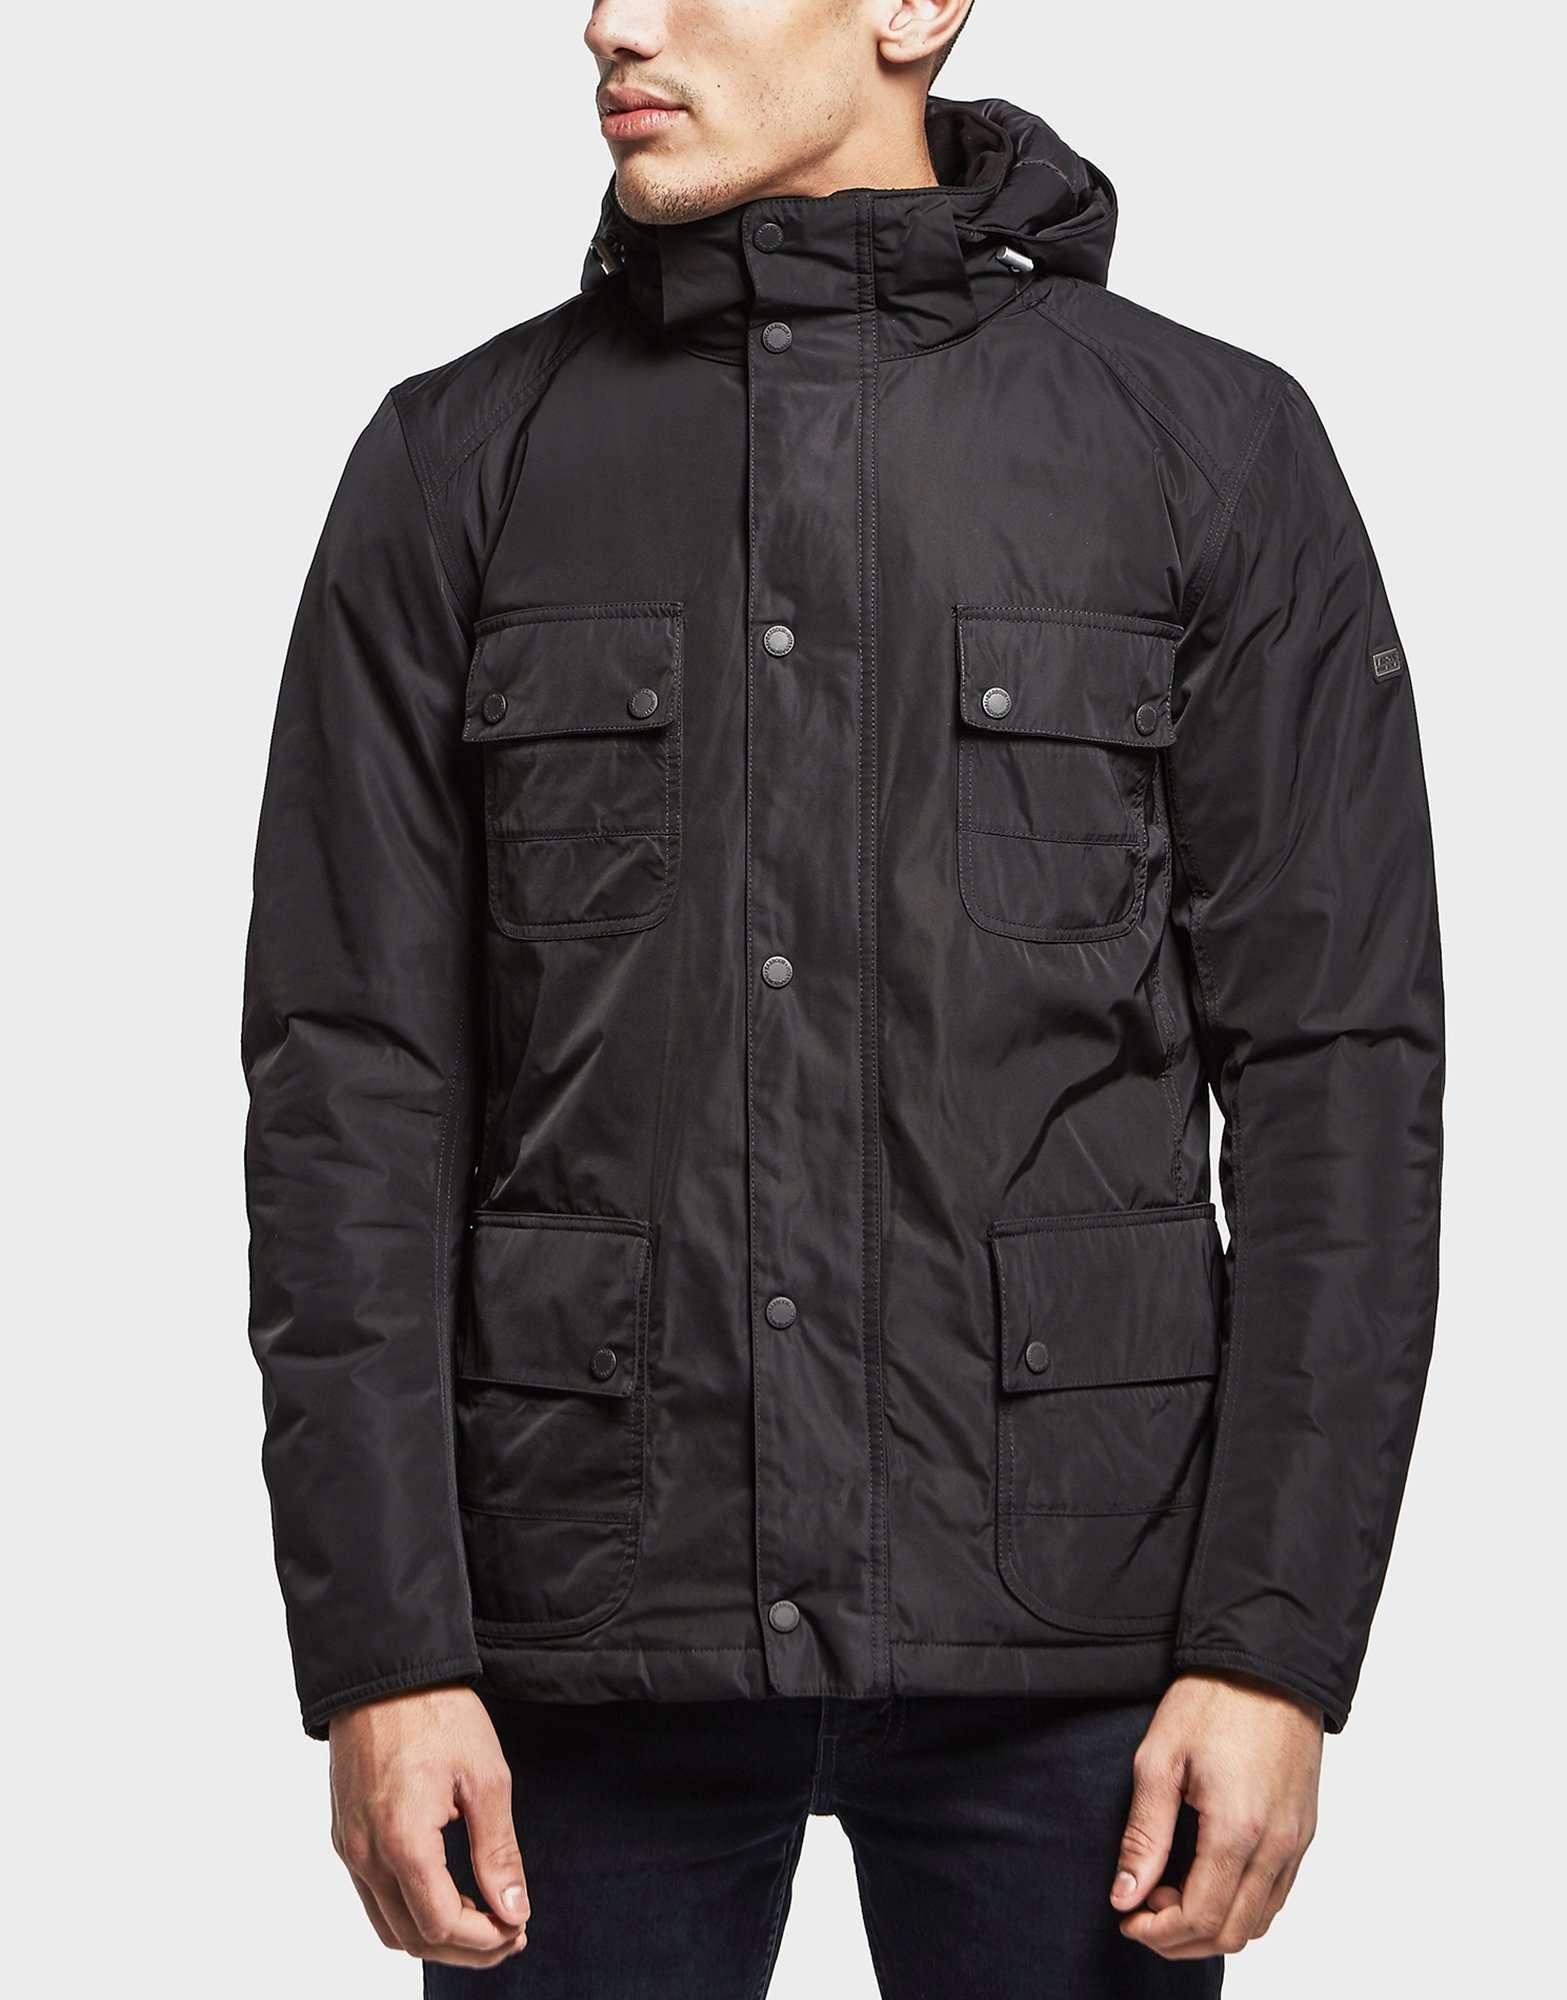 hei clothing ralph quilt men twill fmt jacket mens produt cotton quilted coats image lauren jackets wid